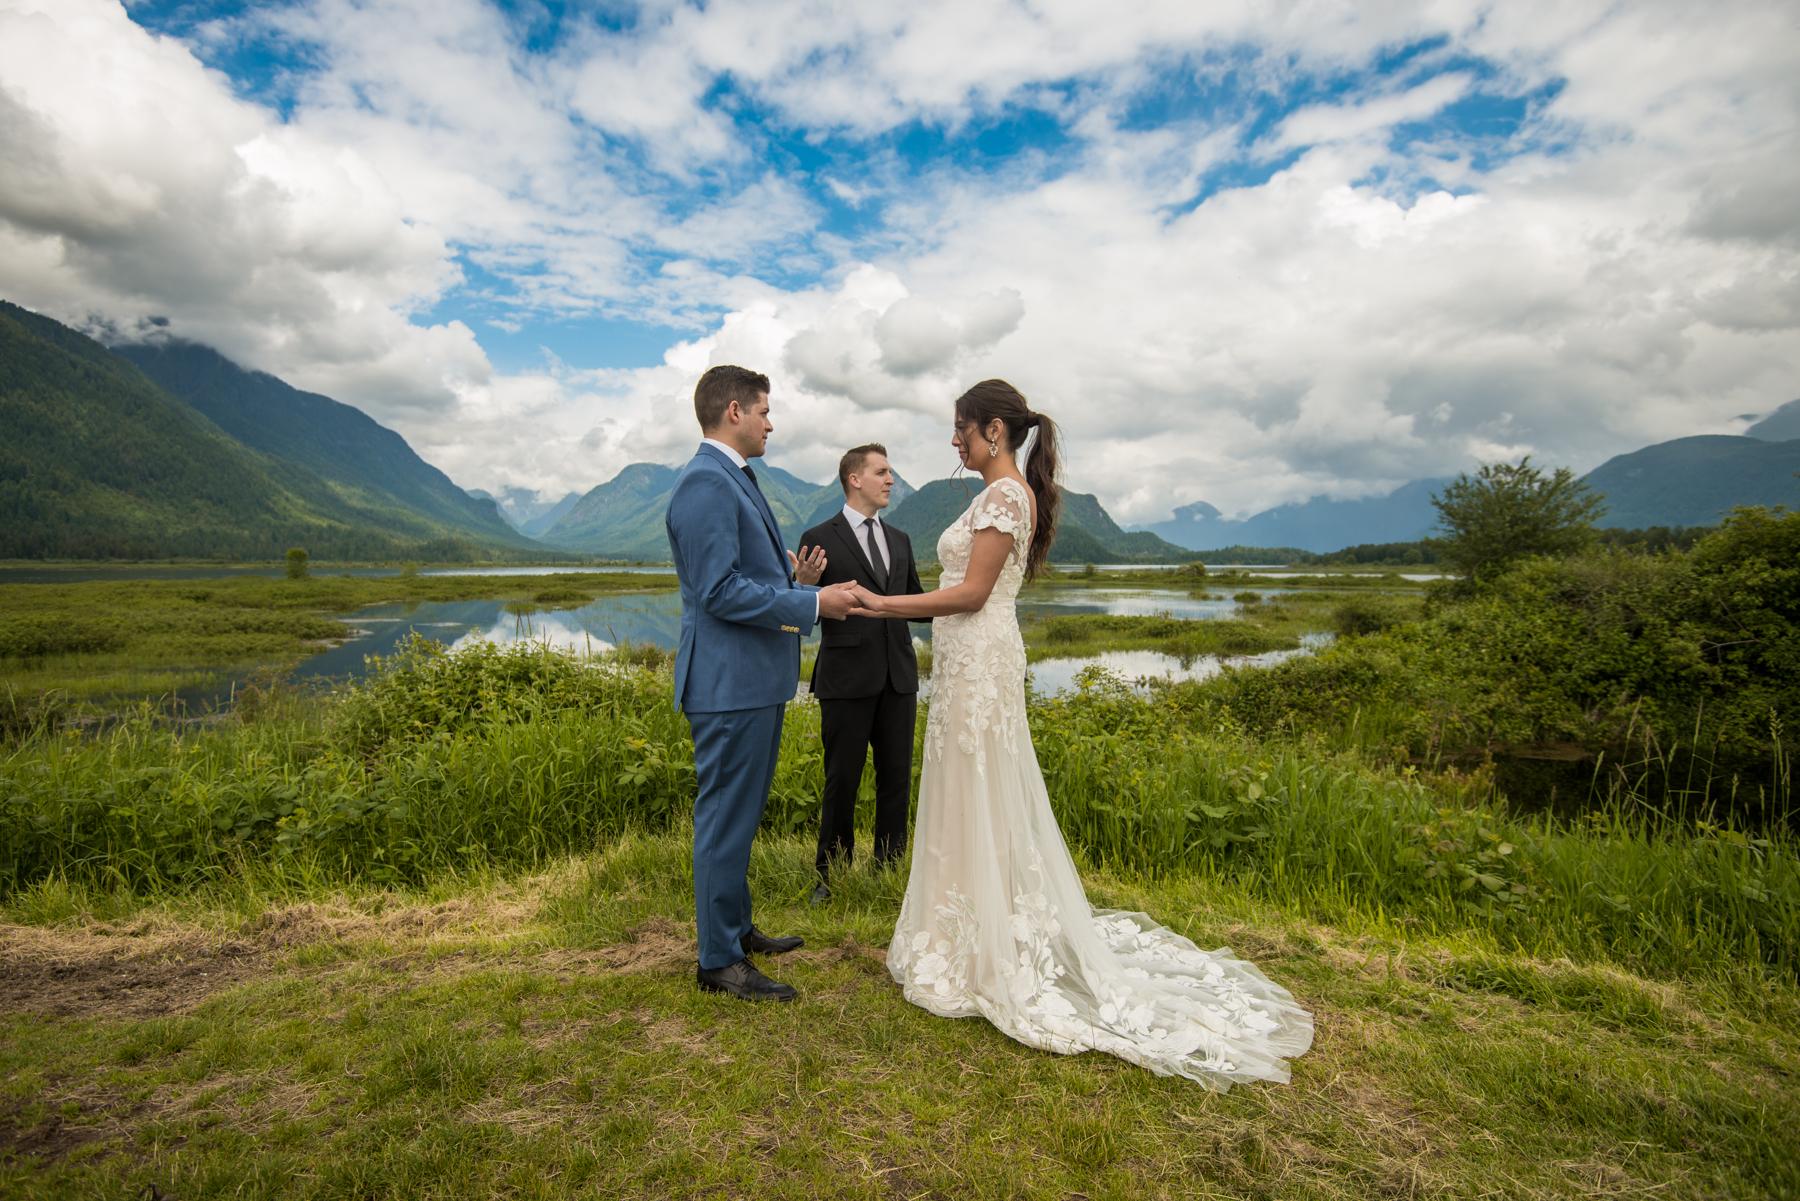 dp-wedding-web-057